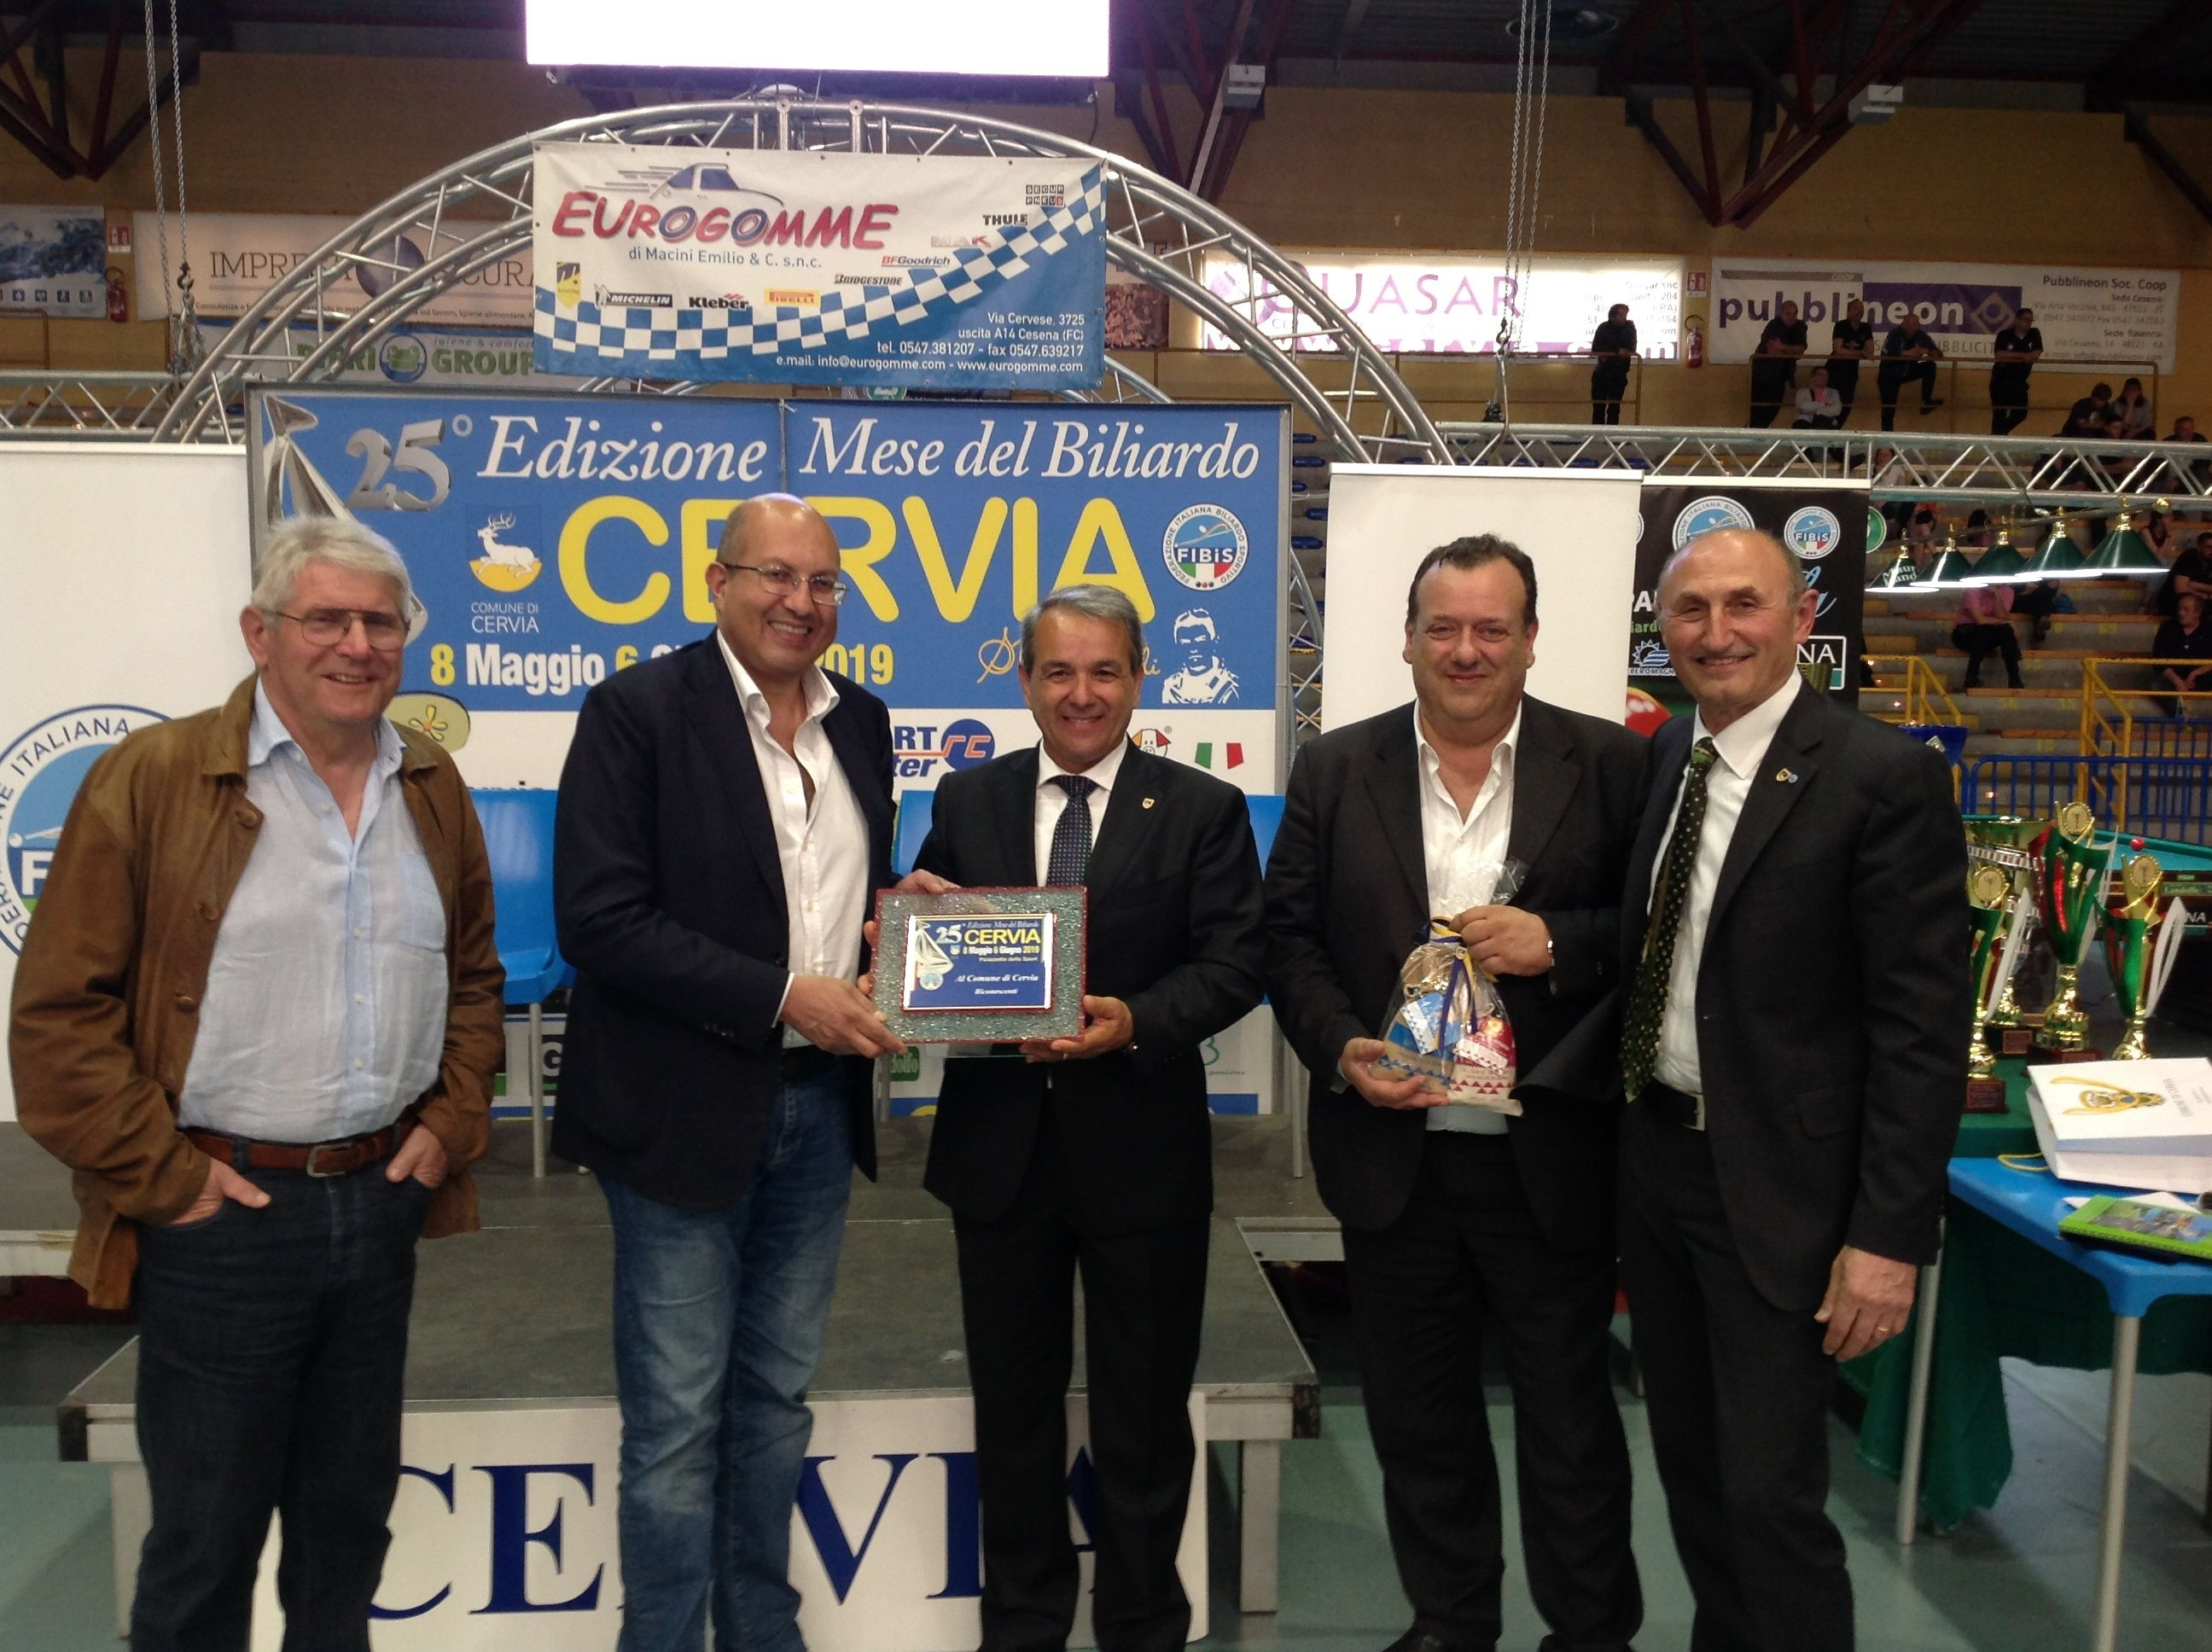 Augusto Landi , Andrea Mancino, Gianni Grandu(Ass. Sport Cervia), Pavio Migliozzi e Loris De Cesari